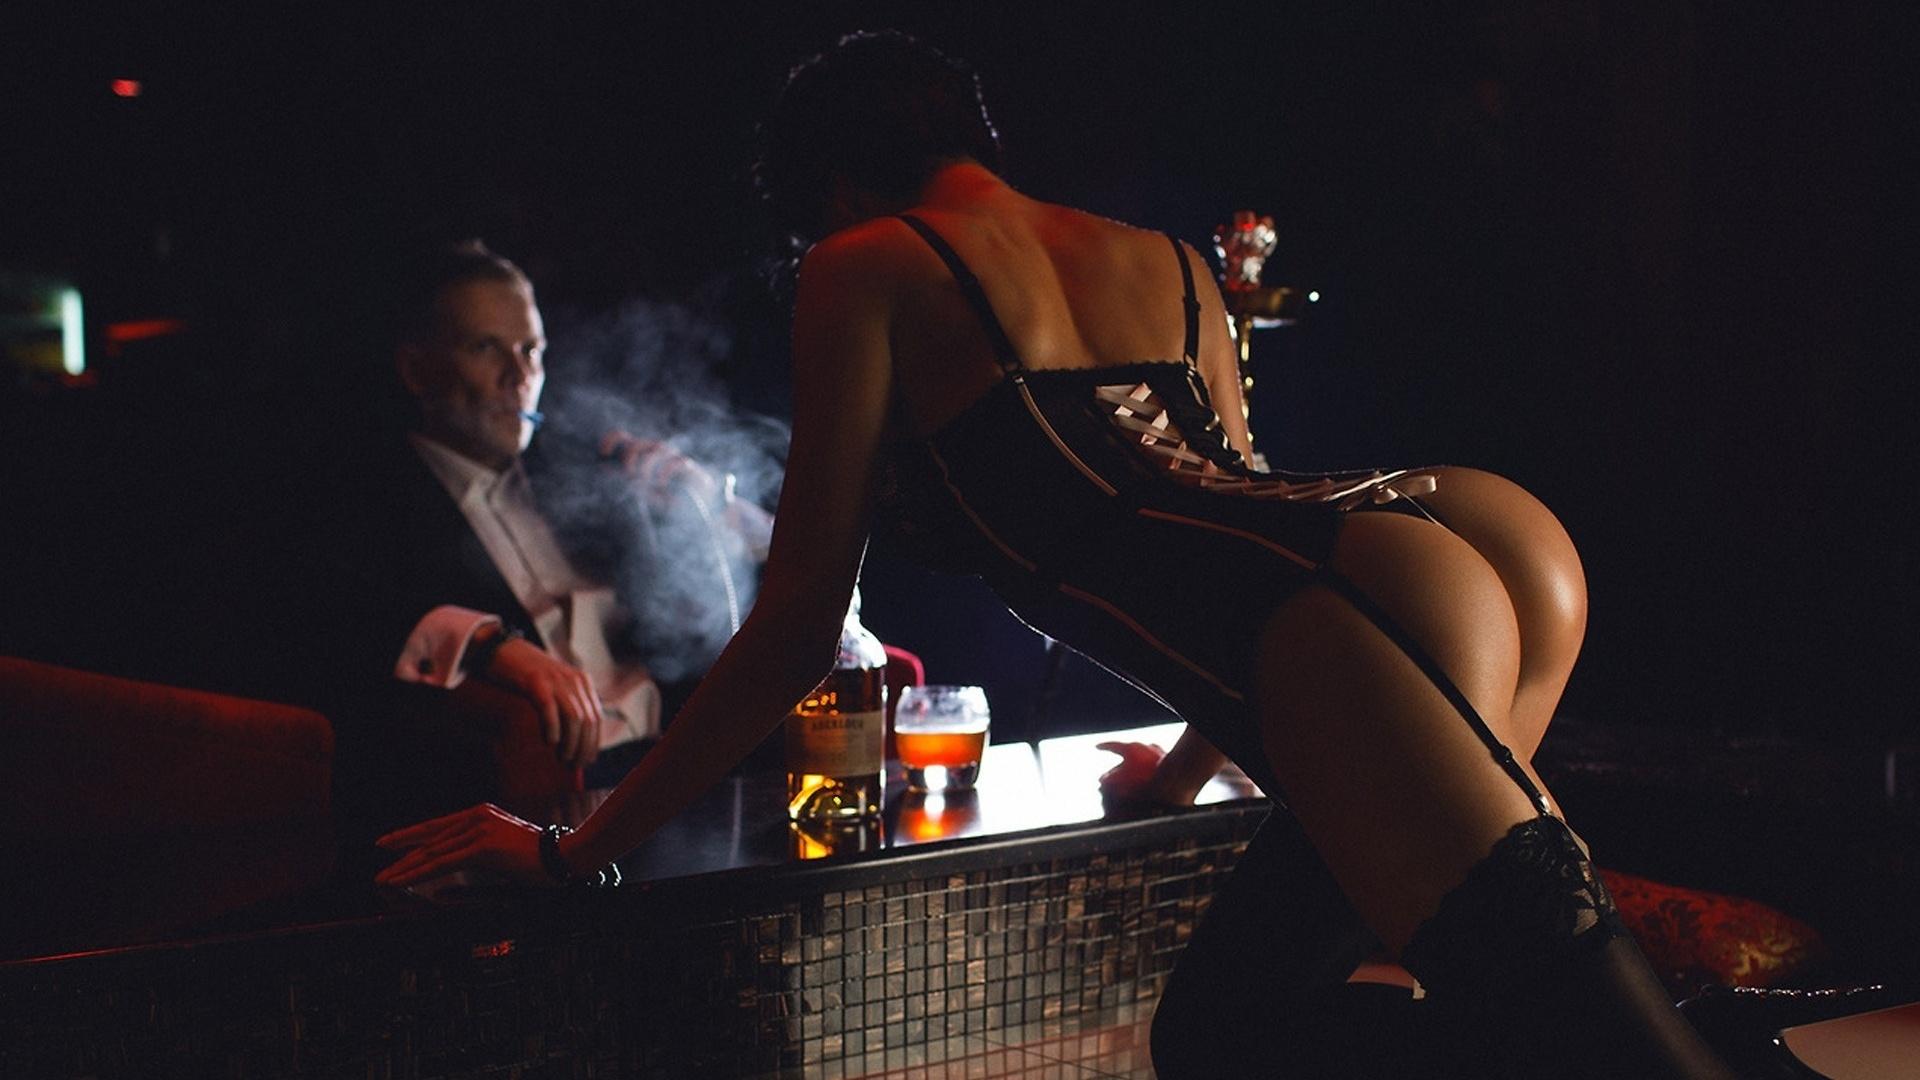 Фото мужчин в стриптиз баре 7 фотография